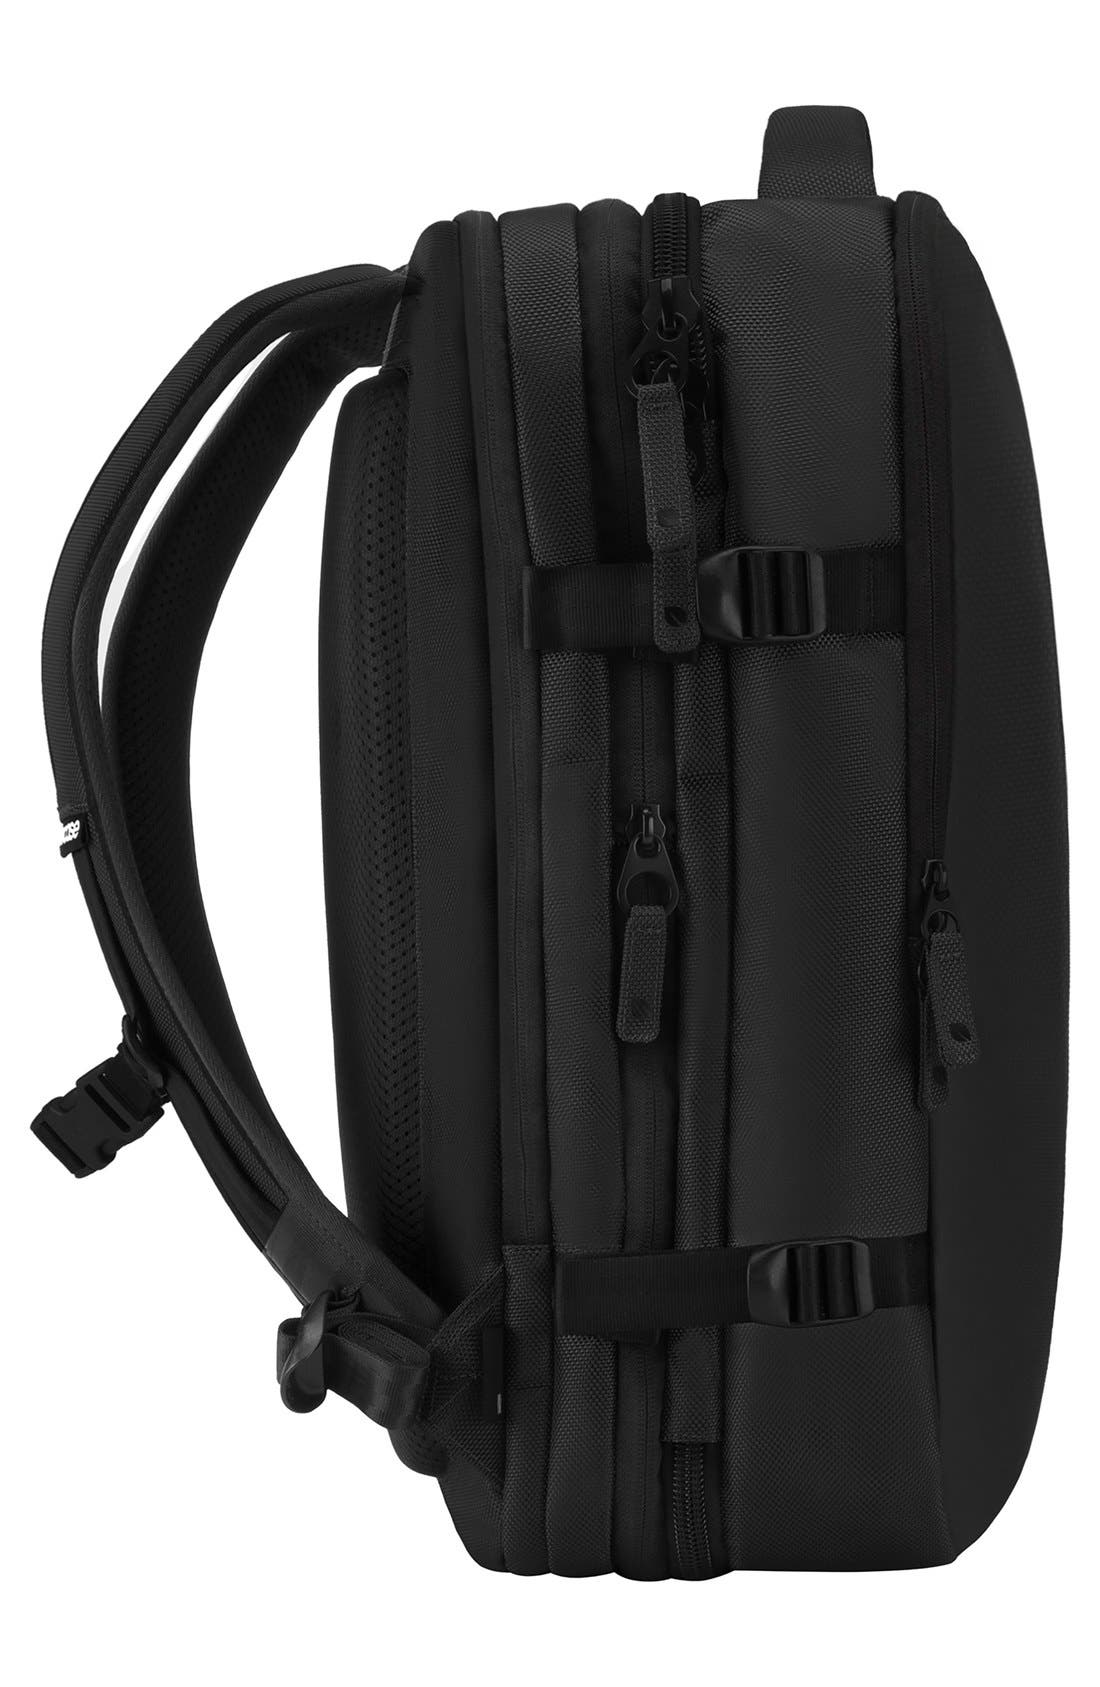 VIA Backpack,                             Alternate thumbnail 4, color,                             001